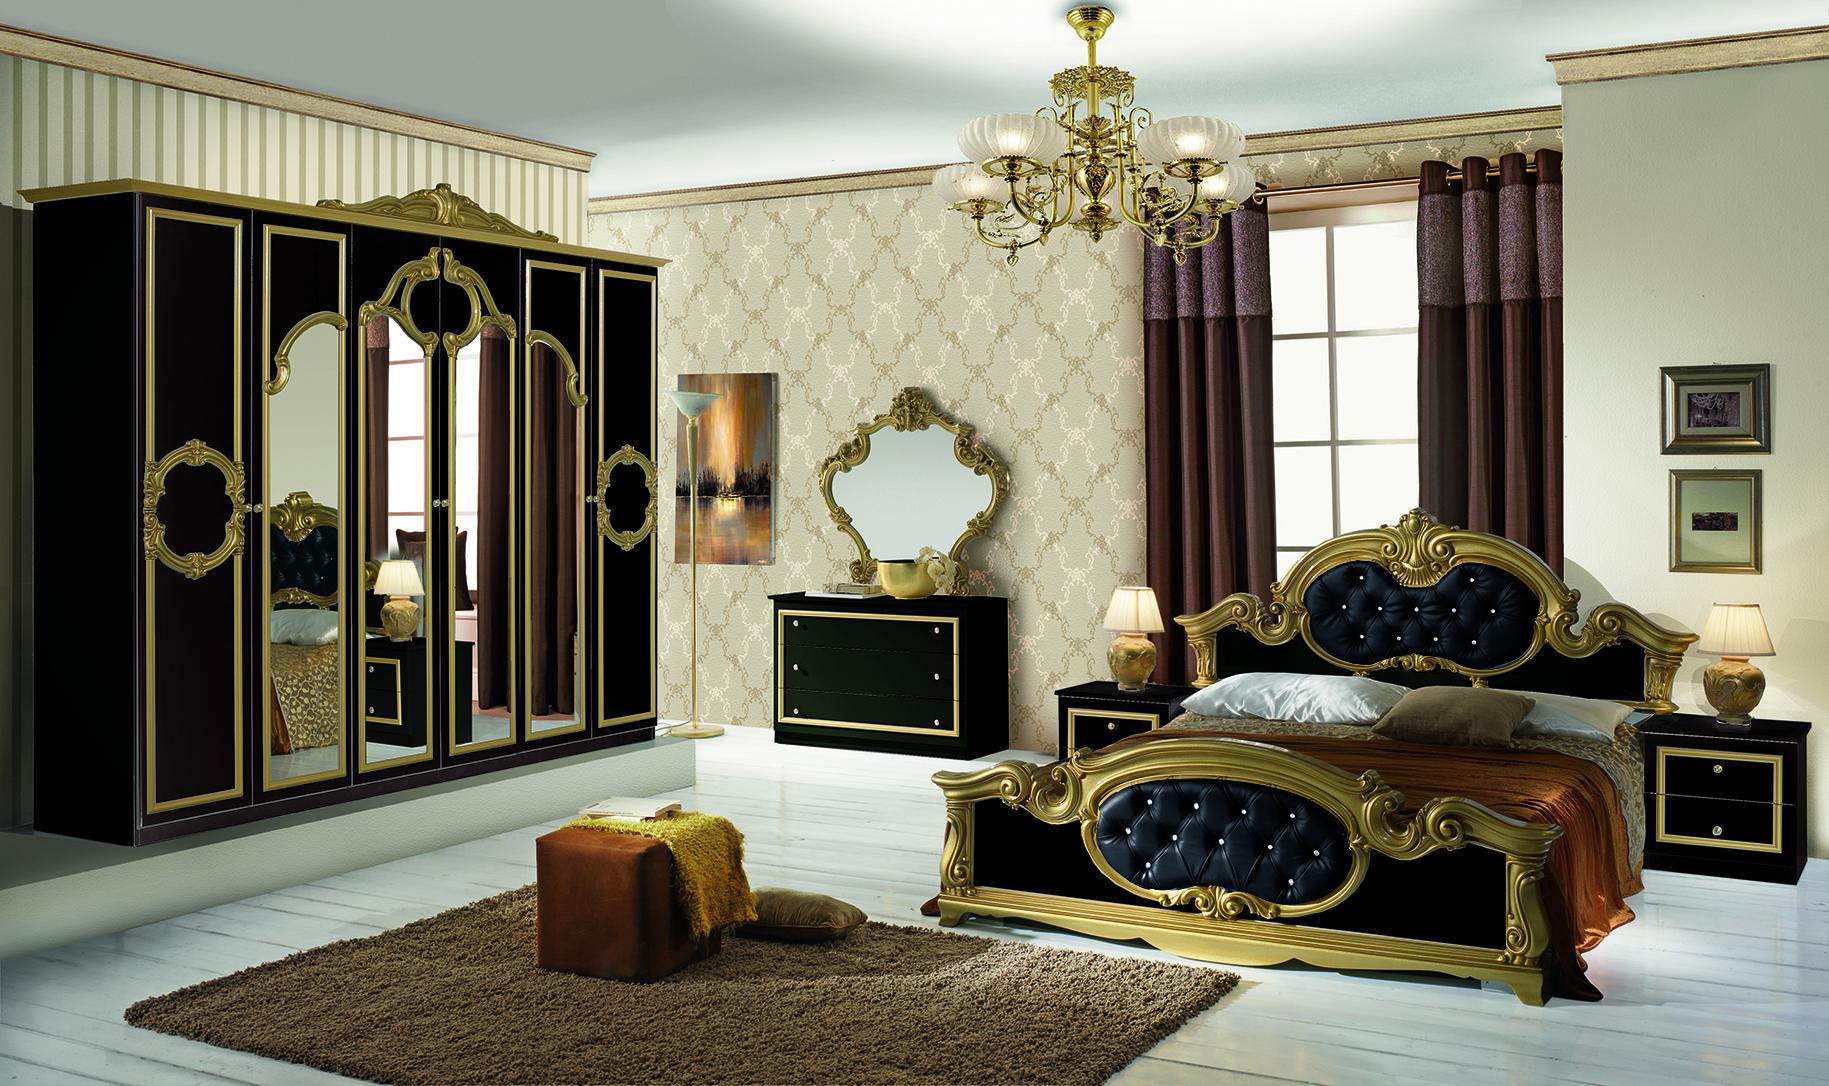 Schlafzimmer Barock